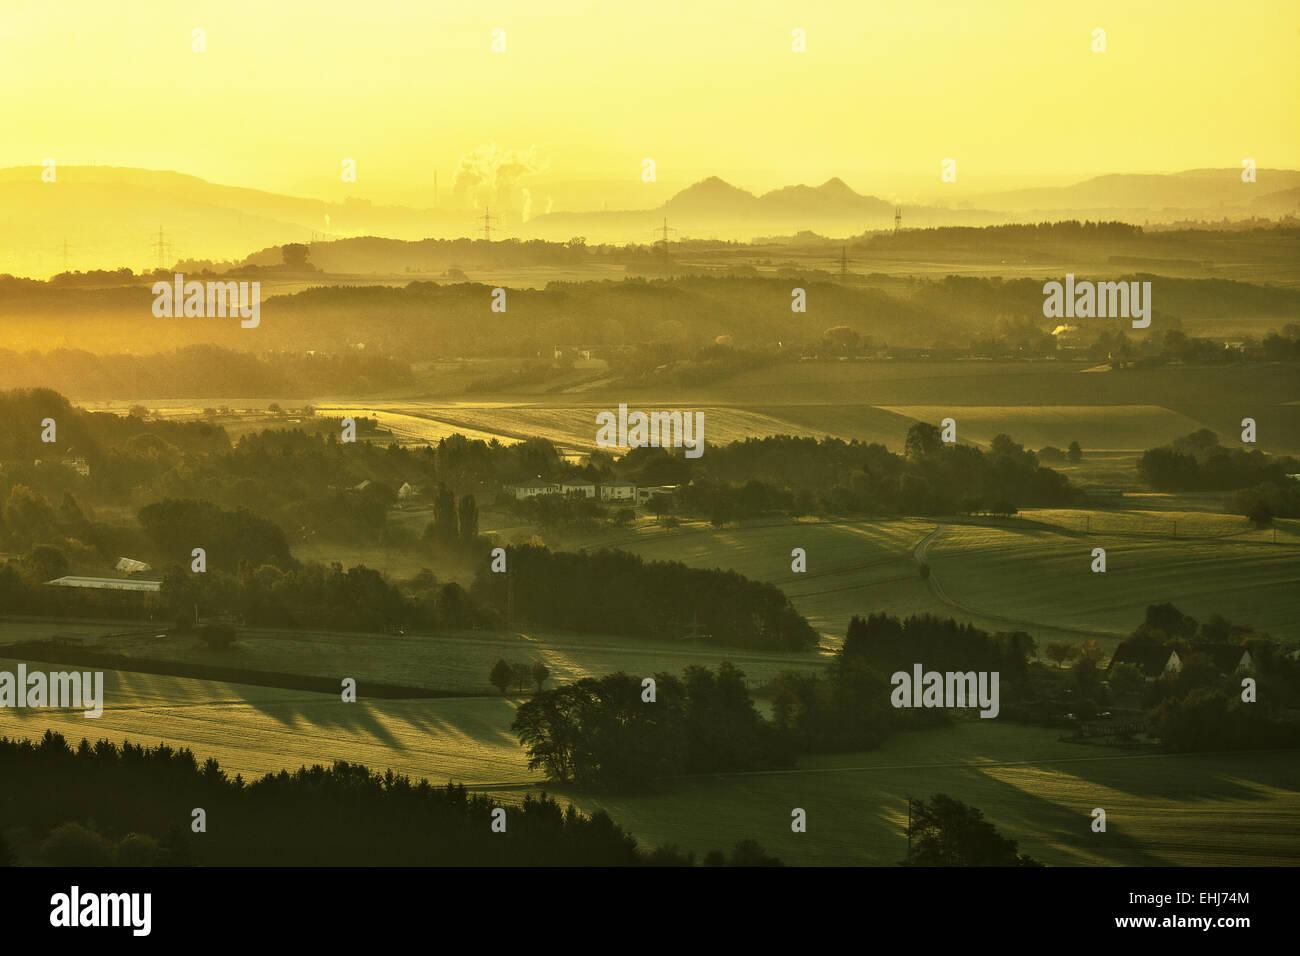 Landscape near Felsberg, Saarland, Germany - Stock Image